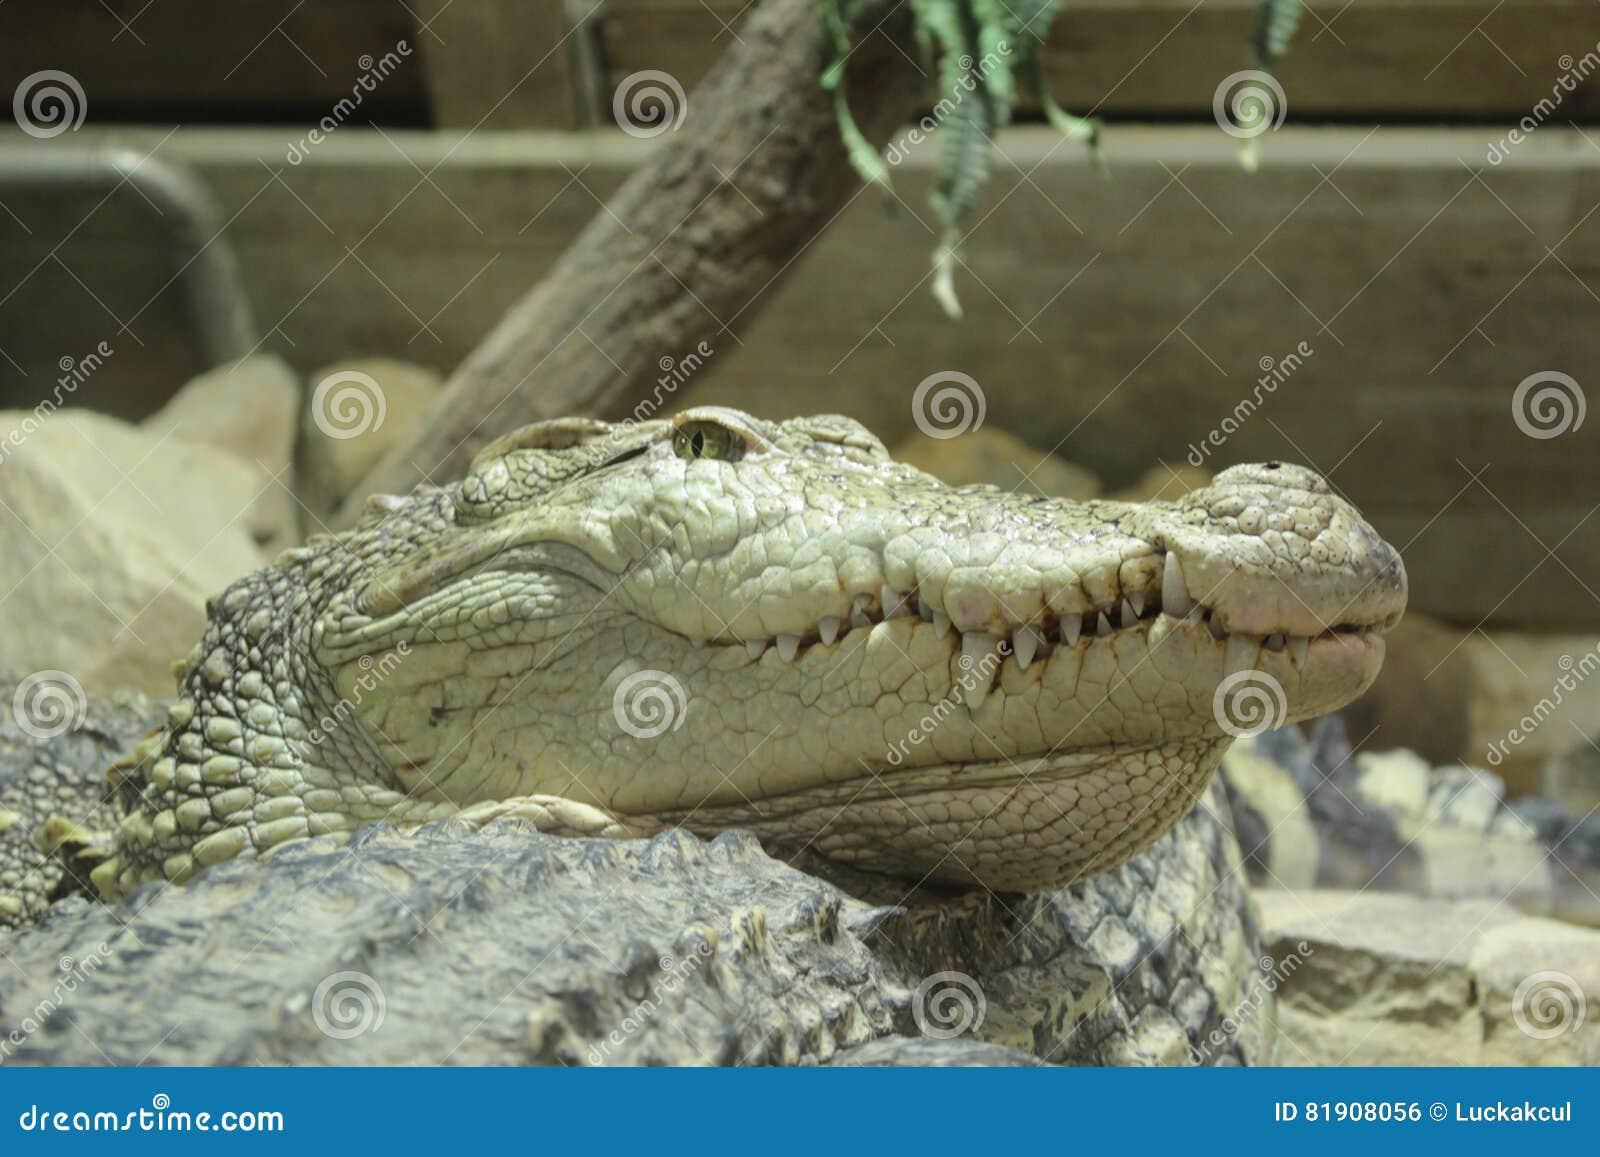 Saltwater Crocodile Stock Photo Image Of Muzzle Nourishment 81908056